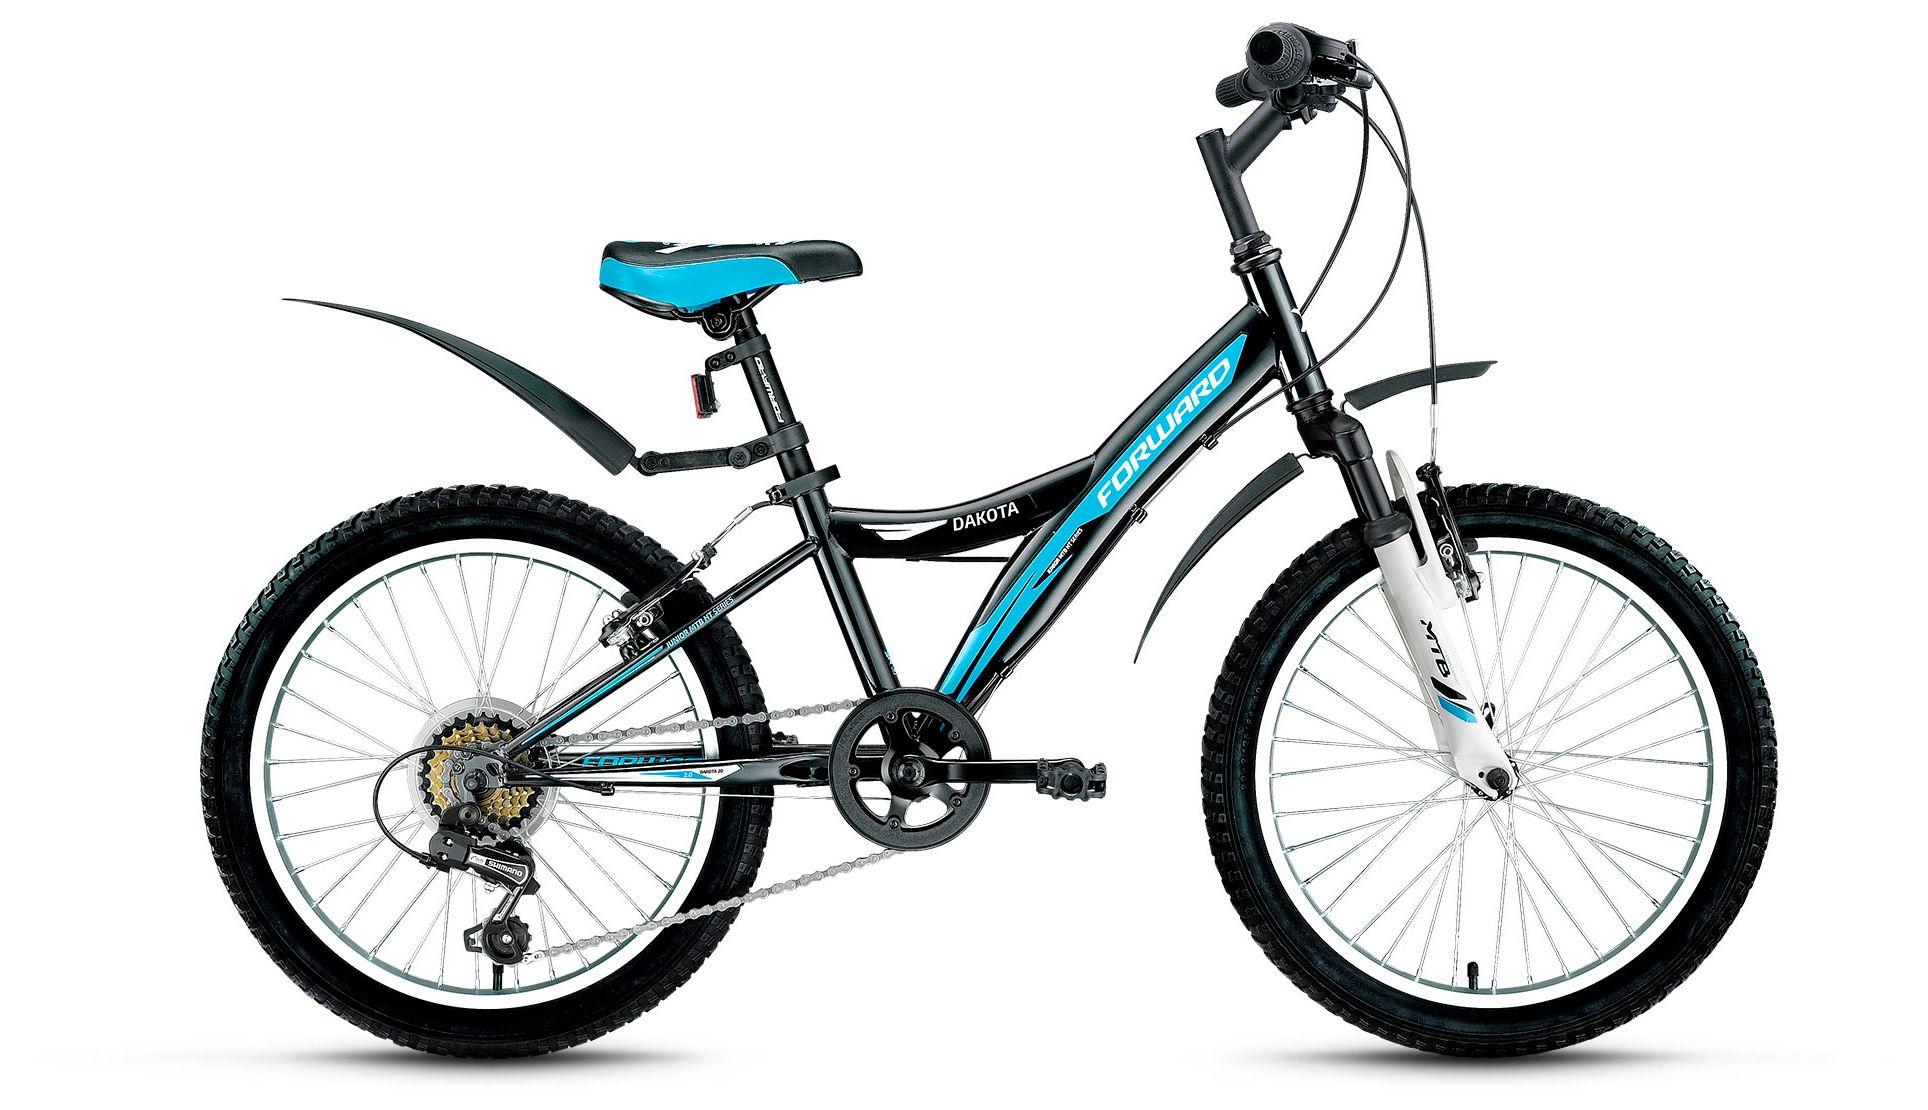 Велосипед Forward Dakota 20 2.0 2017 велосипед forward timba girl 20 2016